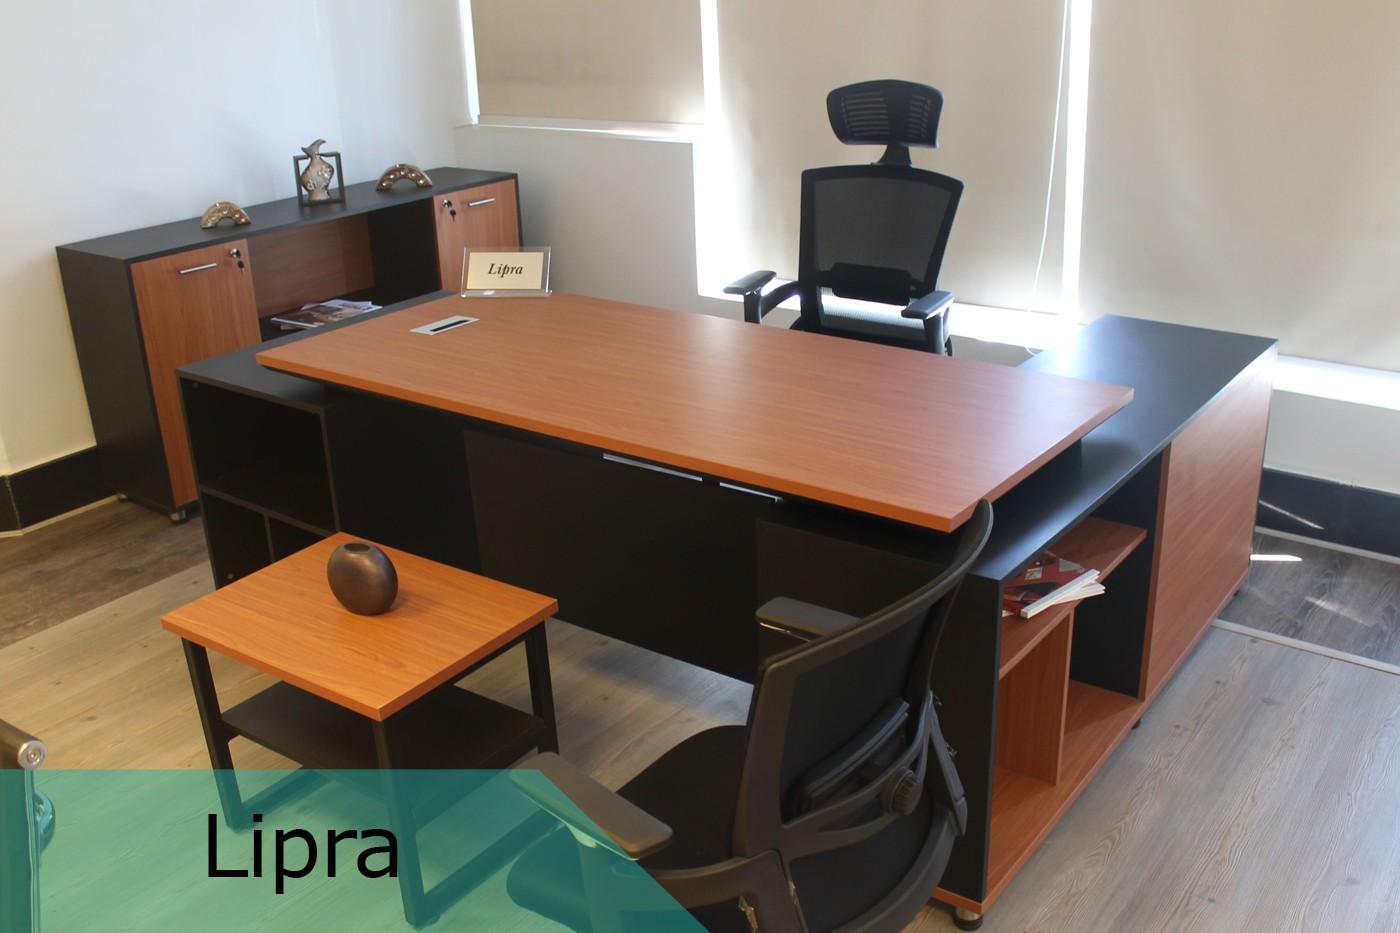 lipra_new